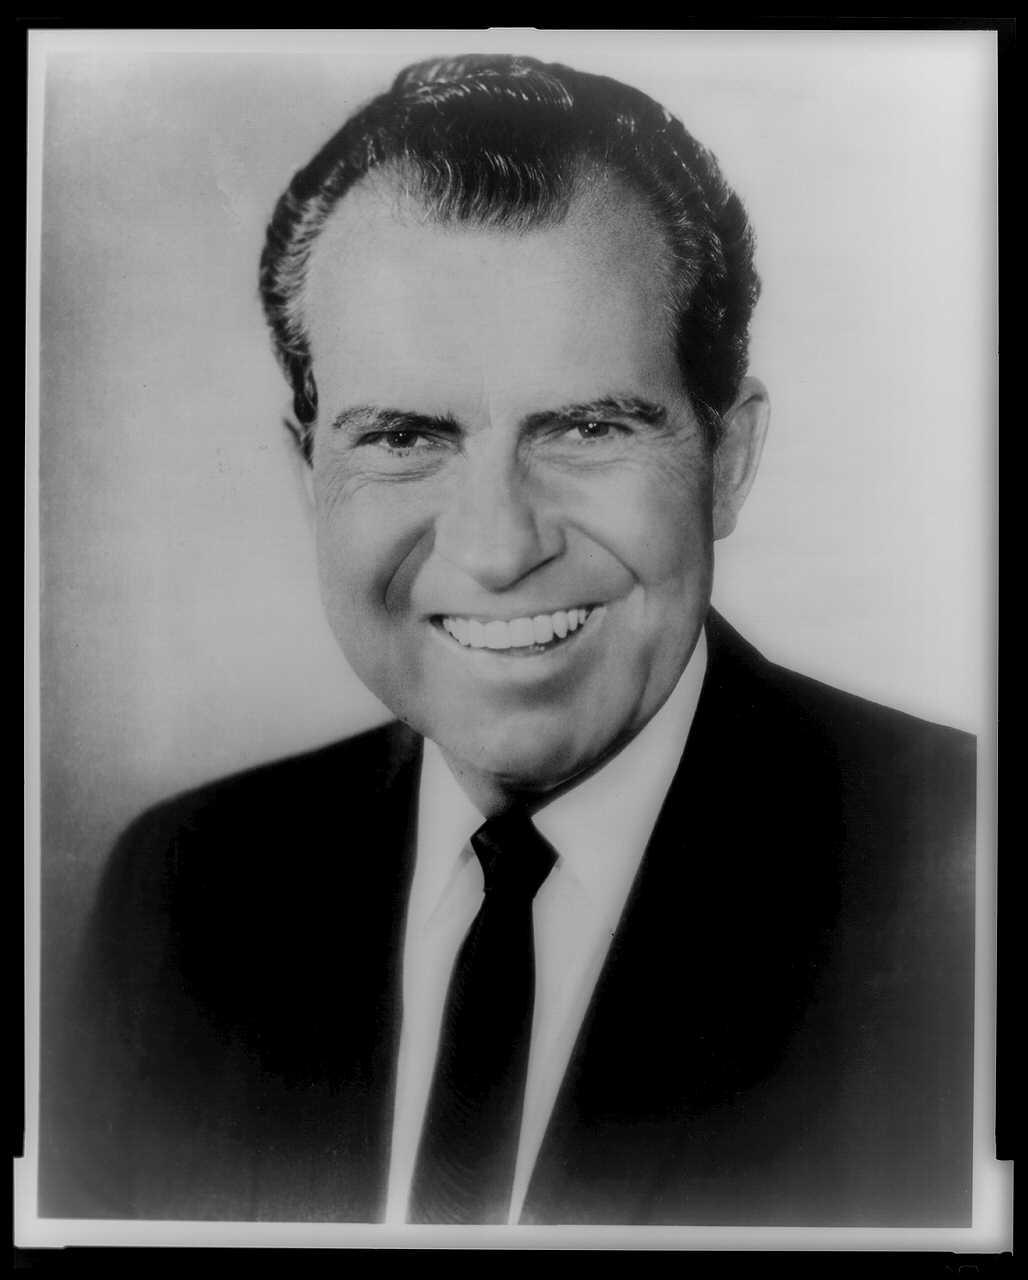 Nixon: The American Freedom